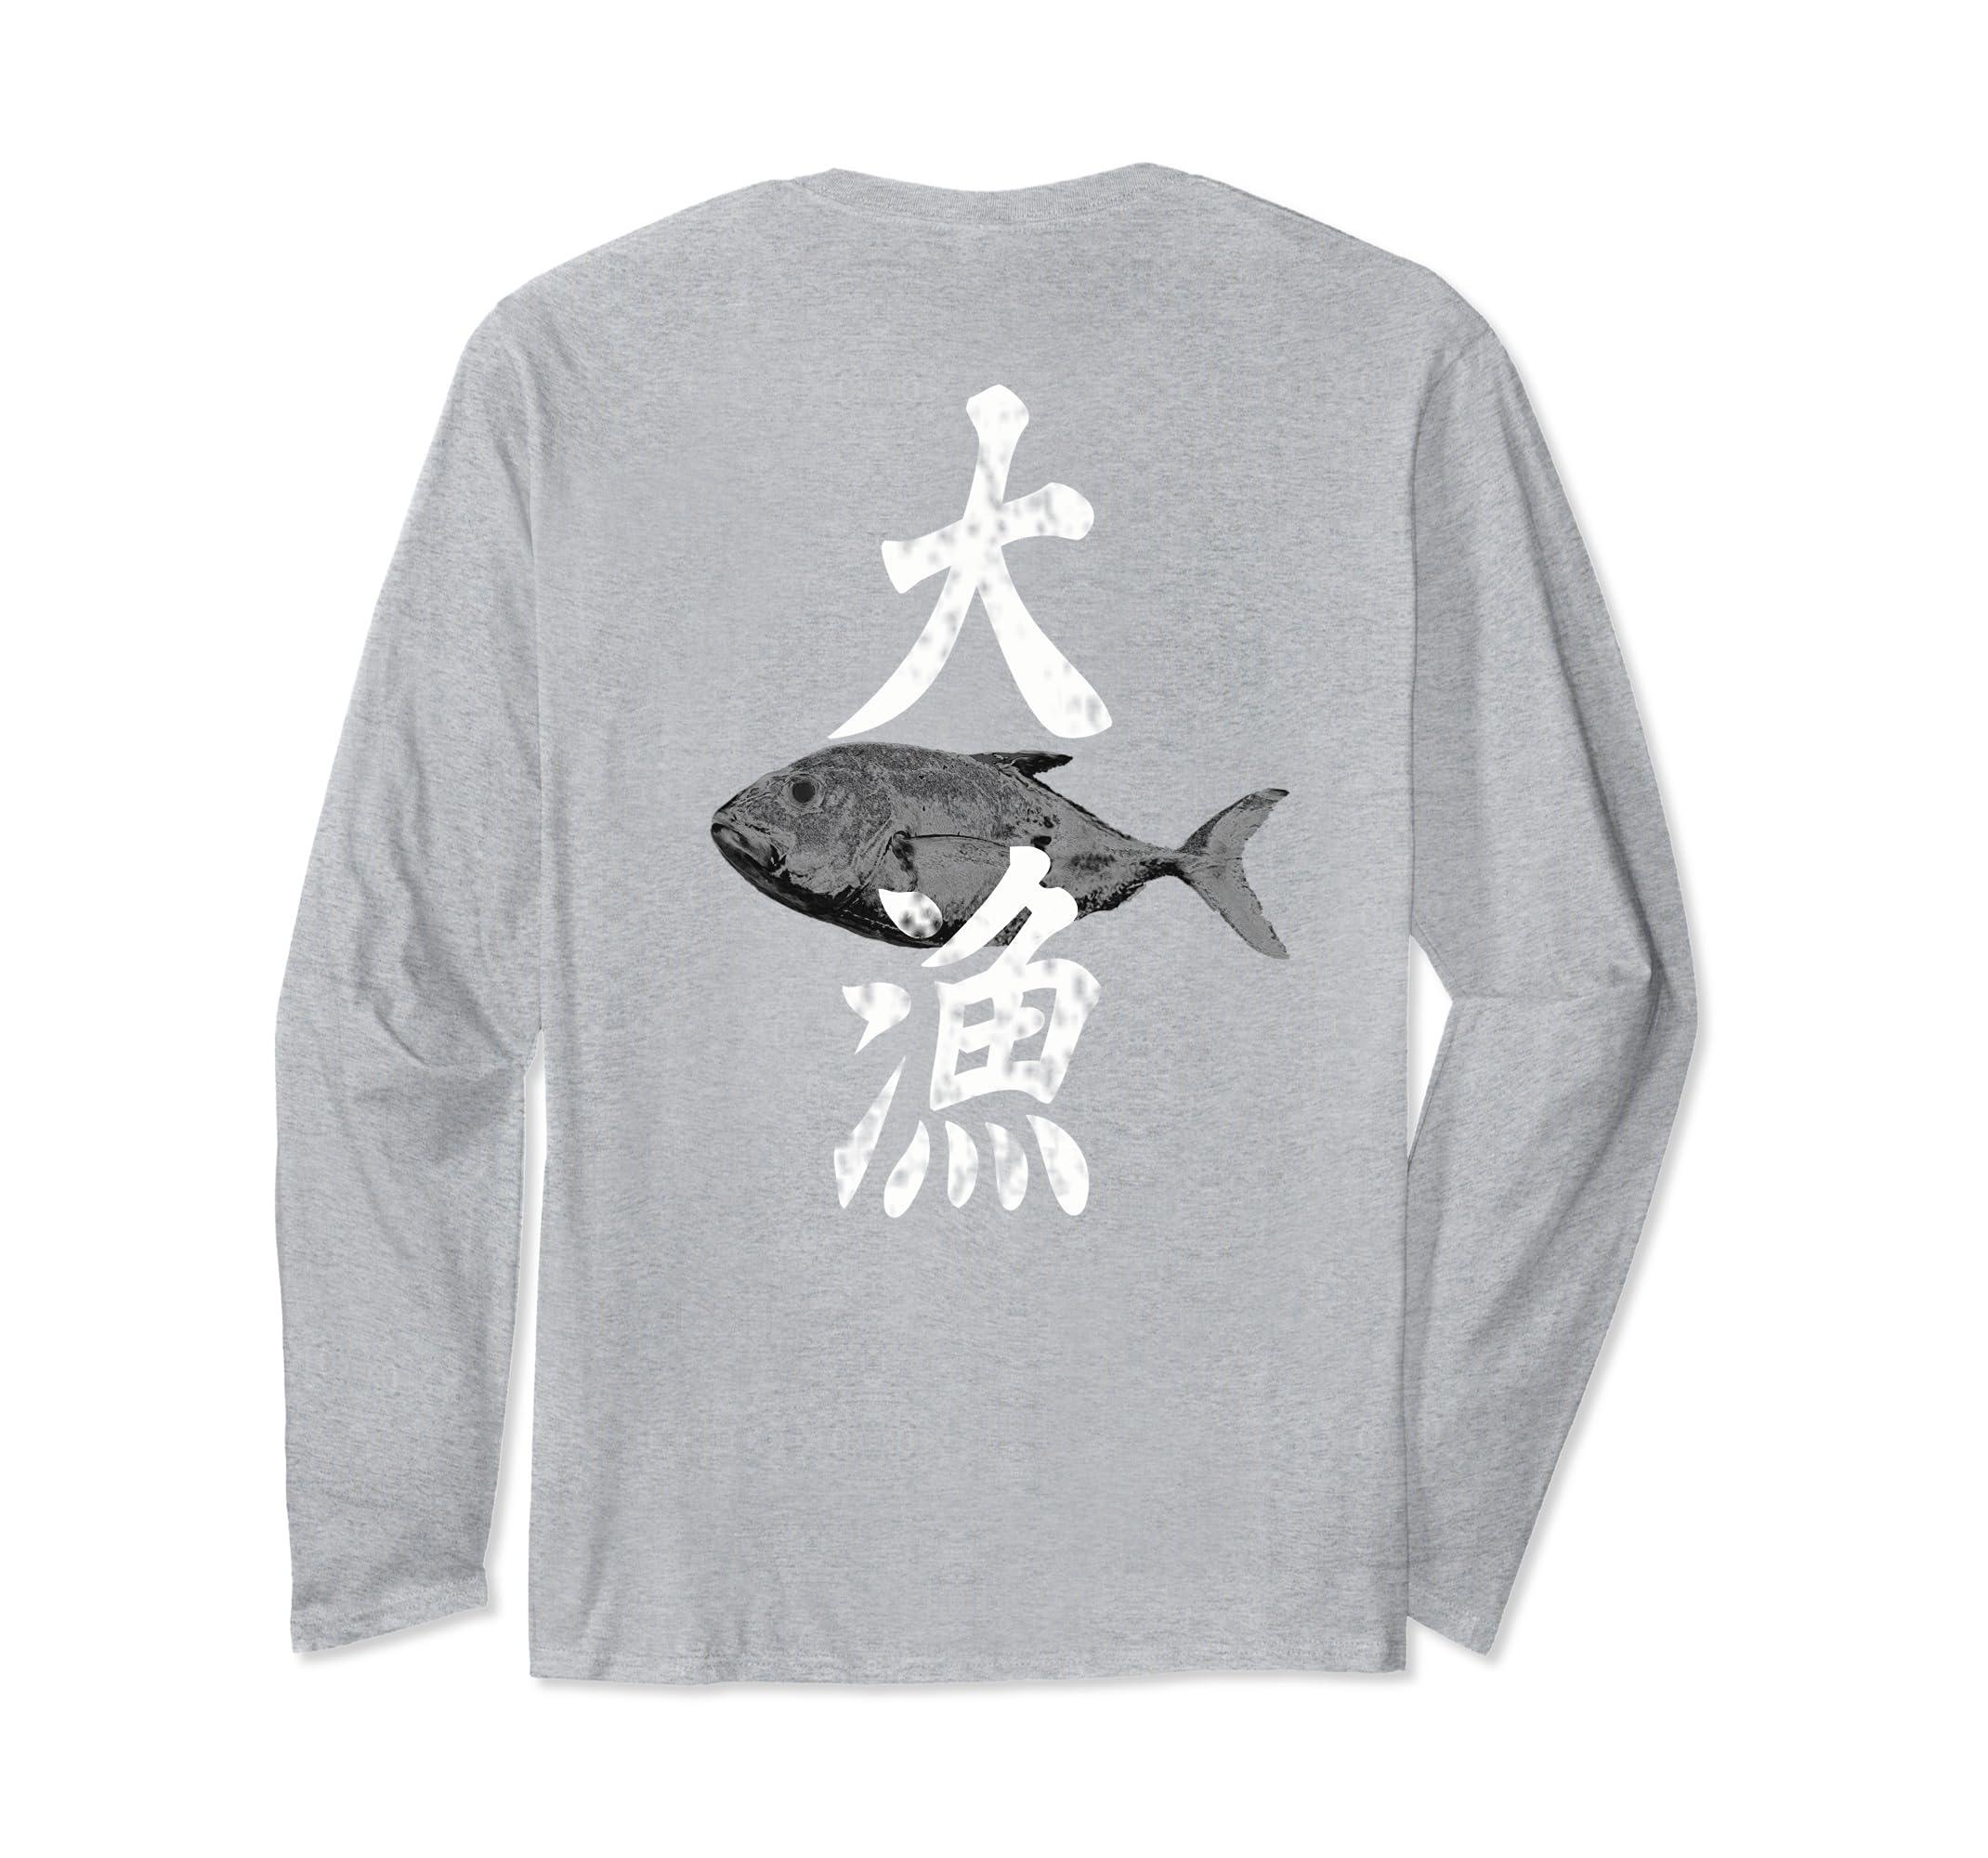 Big Catch Japanese Fishing Long sleeve-ln